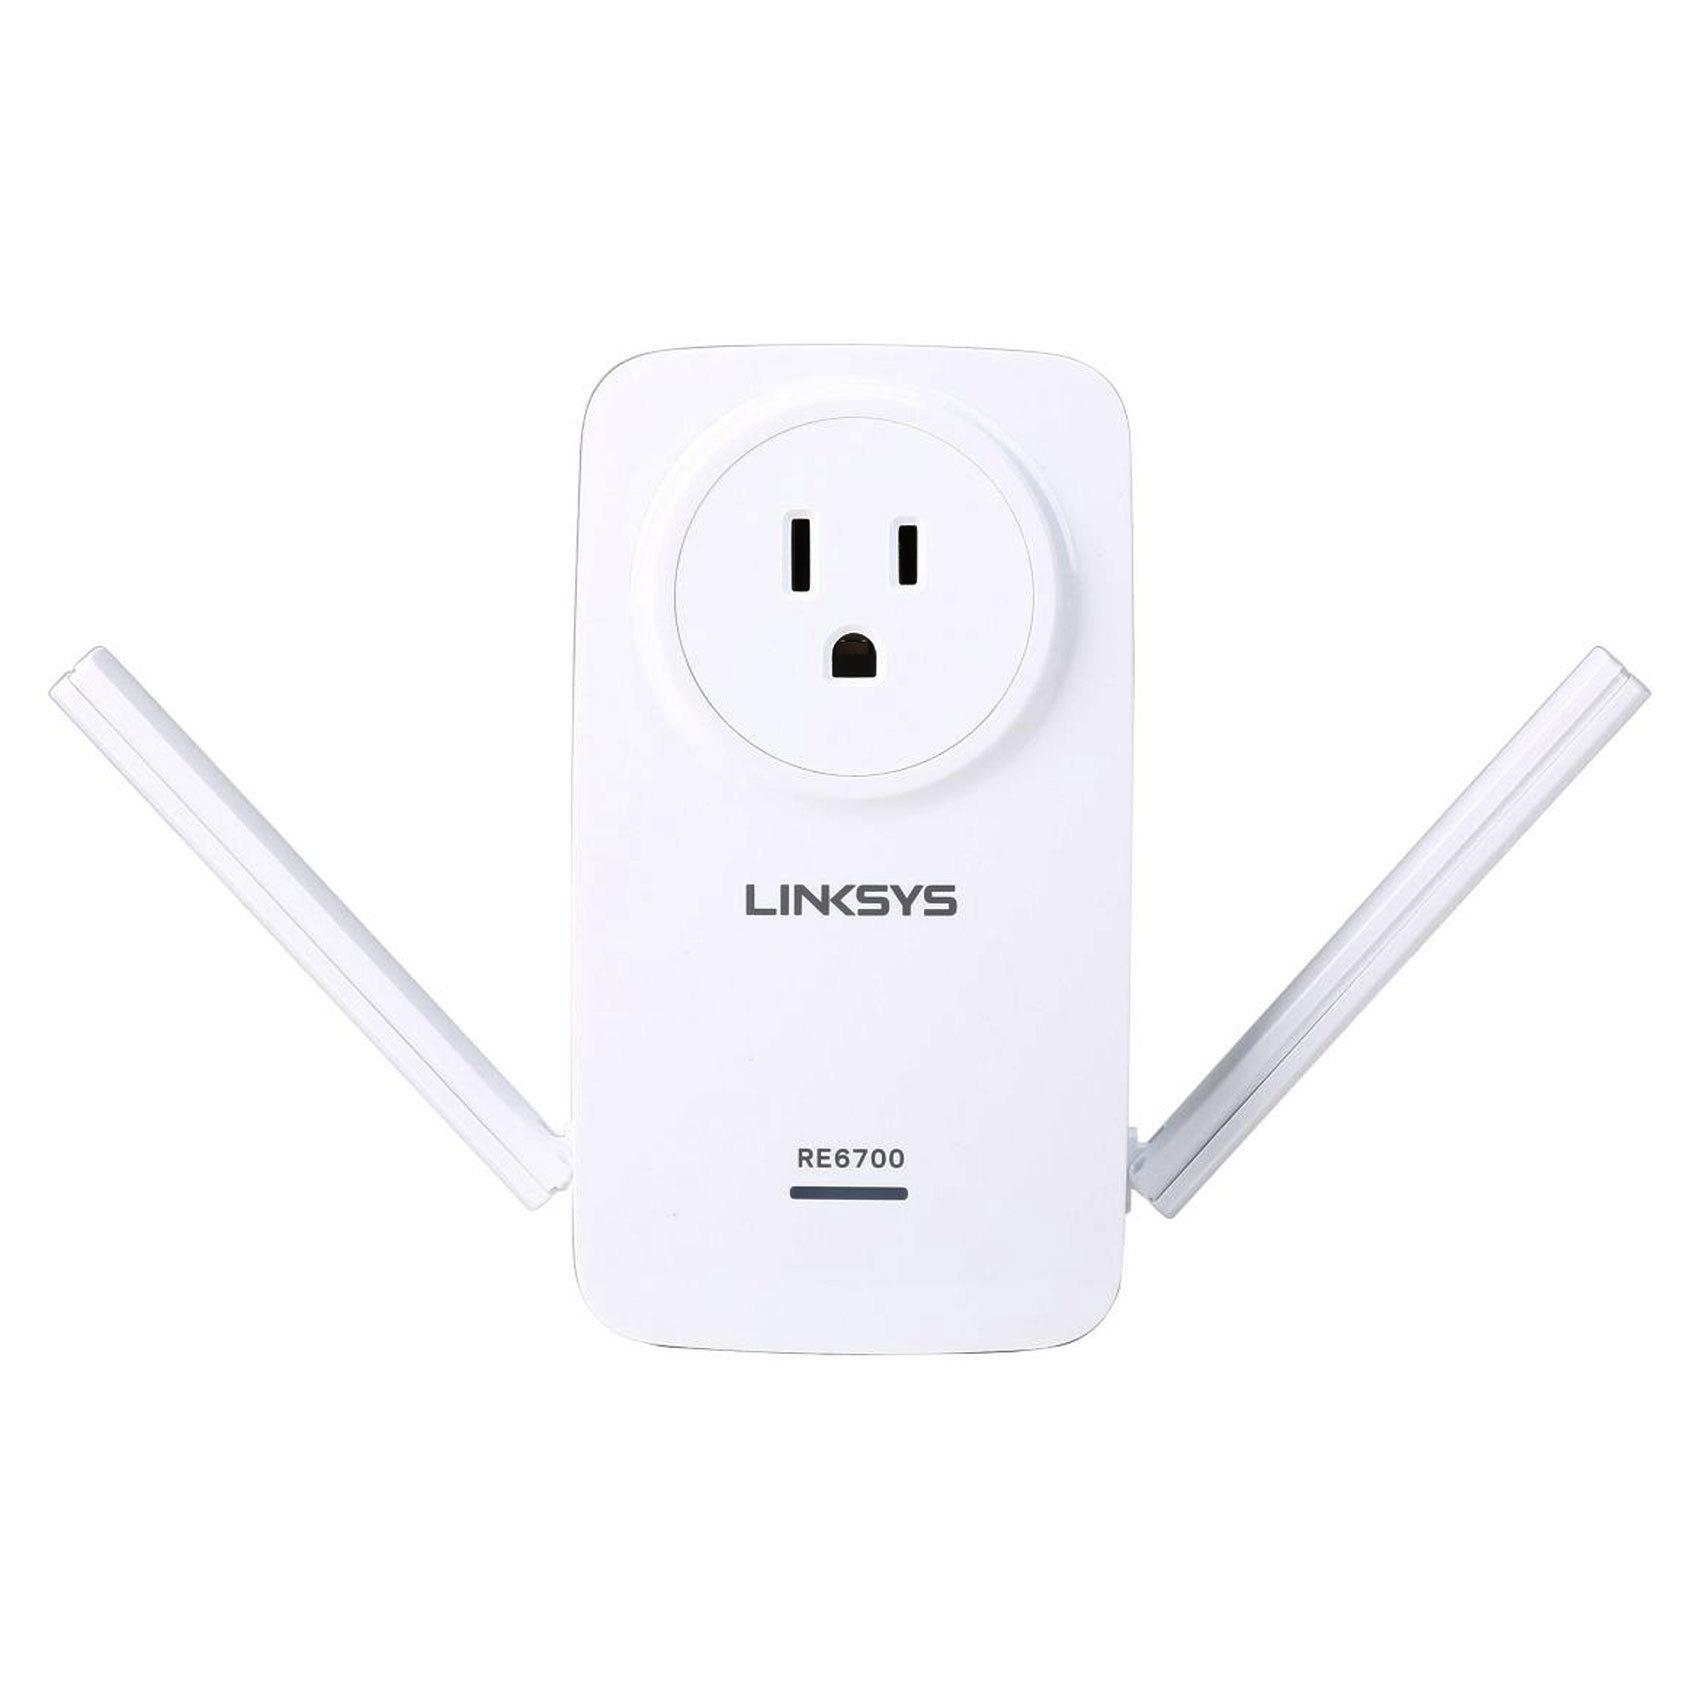 LINKSYS W/L RE AC1200 RE6700